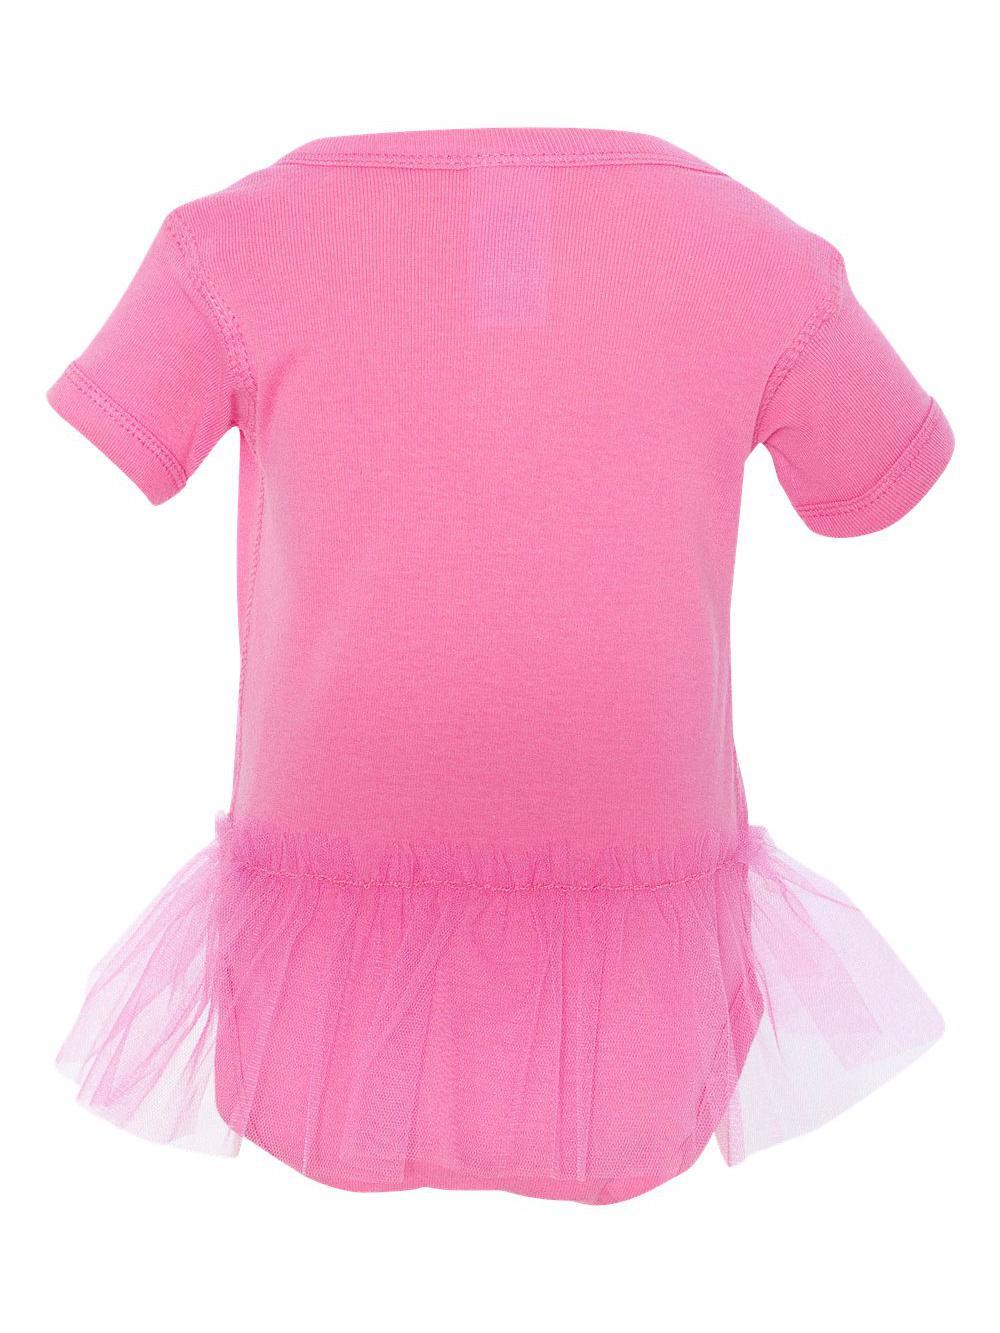 437b7fa6f8a3a Rabbit Skins - Rabbit Skins Infant Tutu Creeper Solid Onesie Girl's 4422 -  Walmart.com